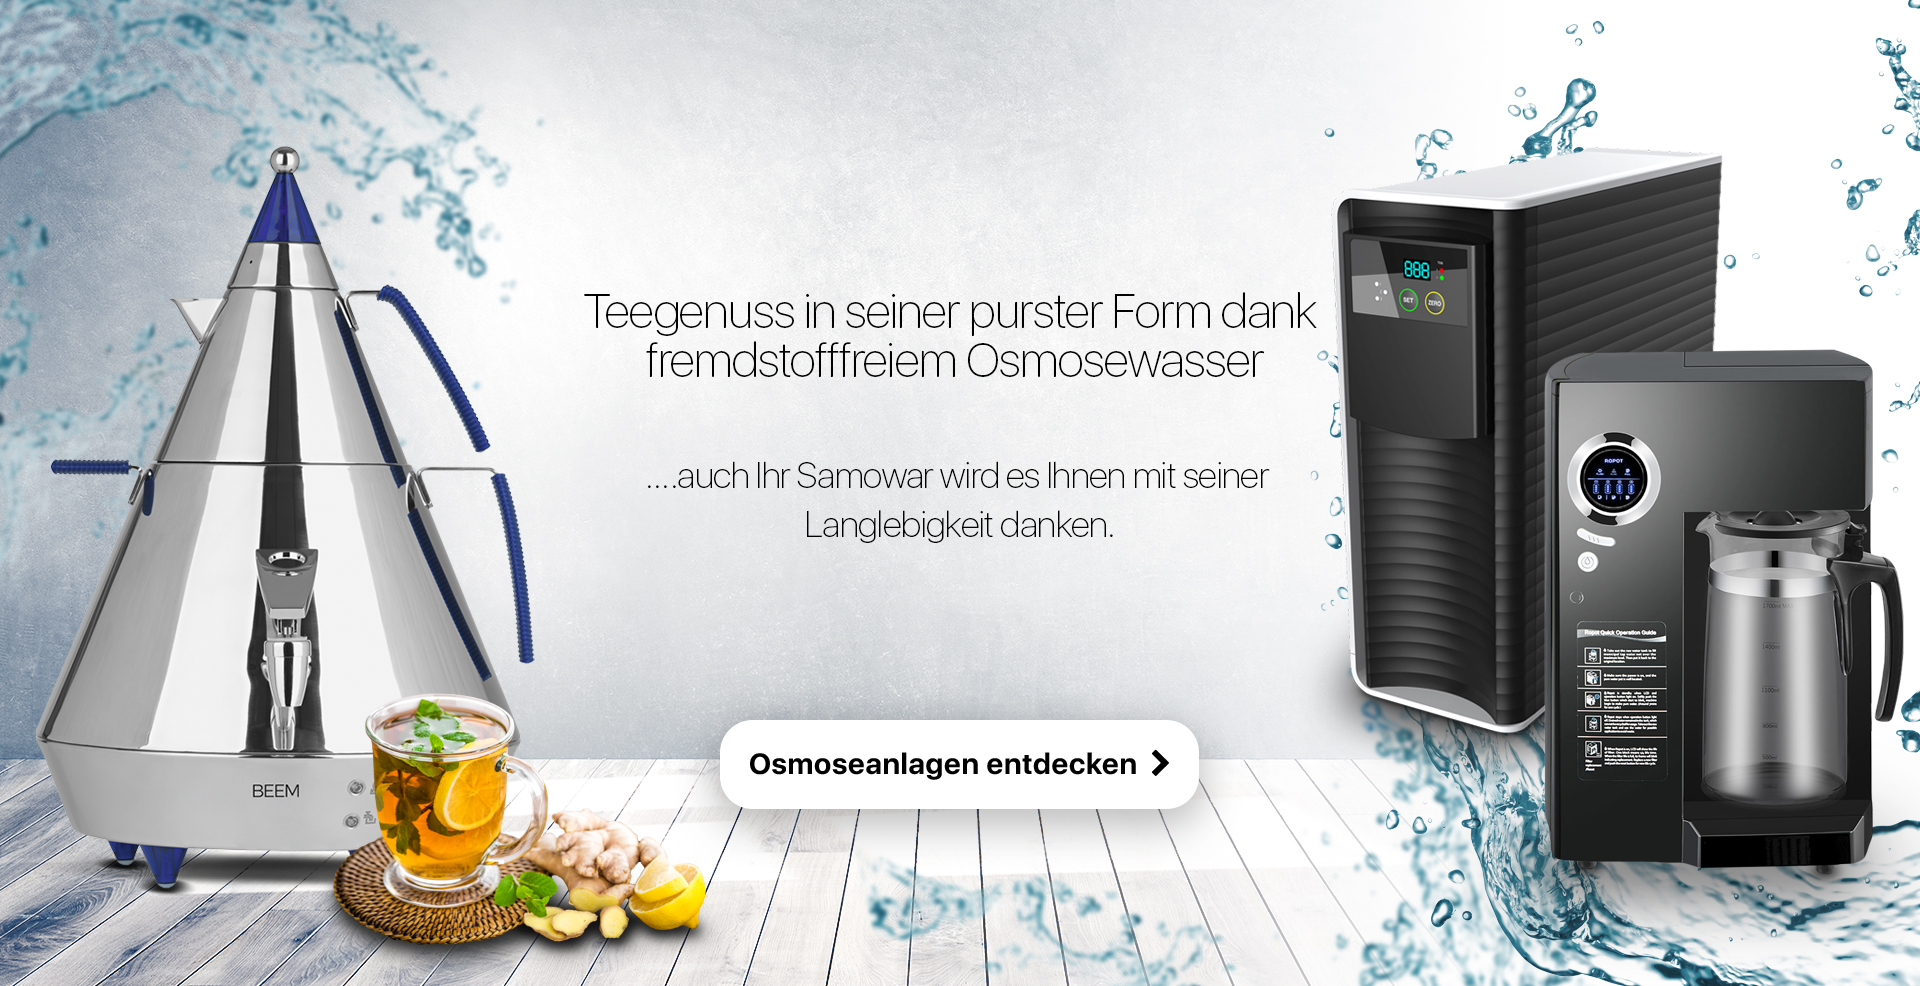 Osmosewasser_ohne-Samoware_01786